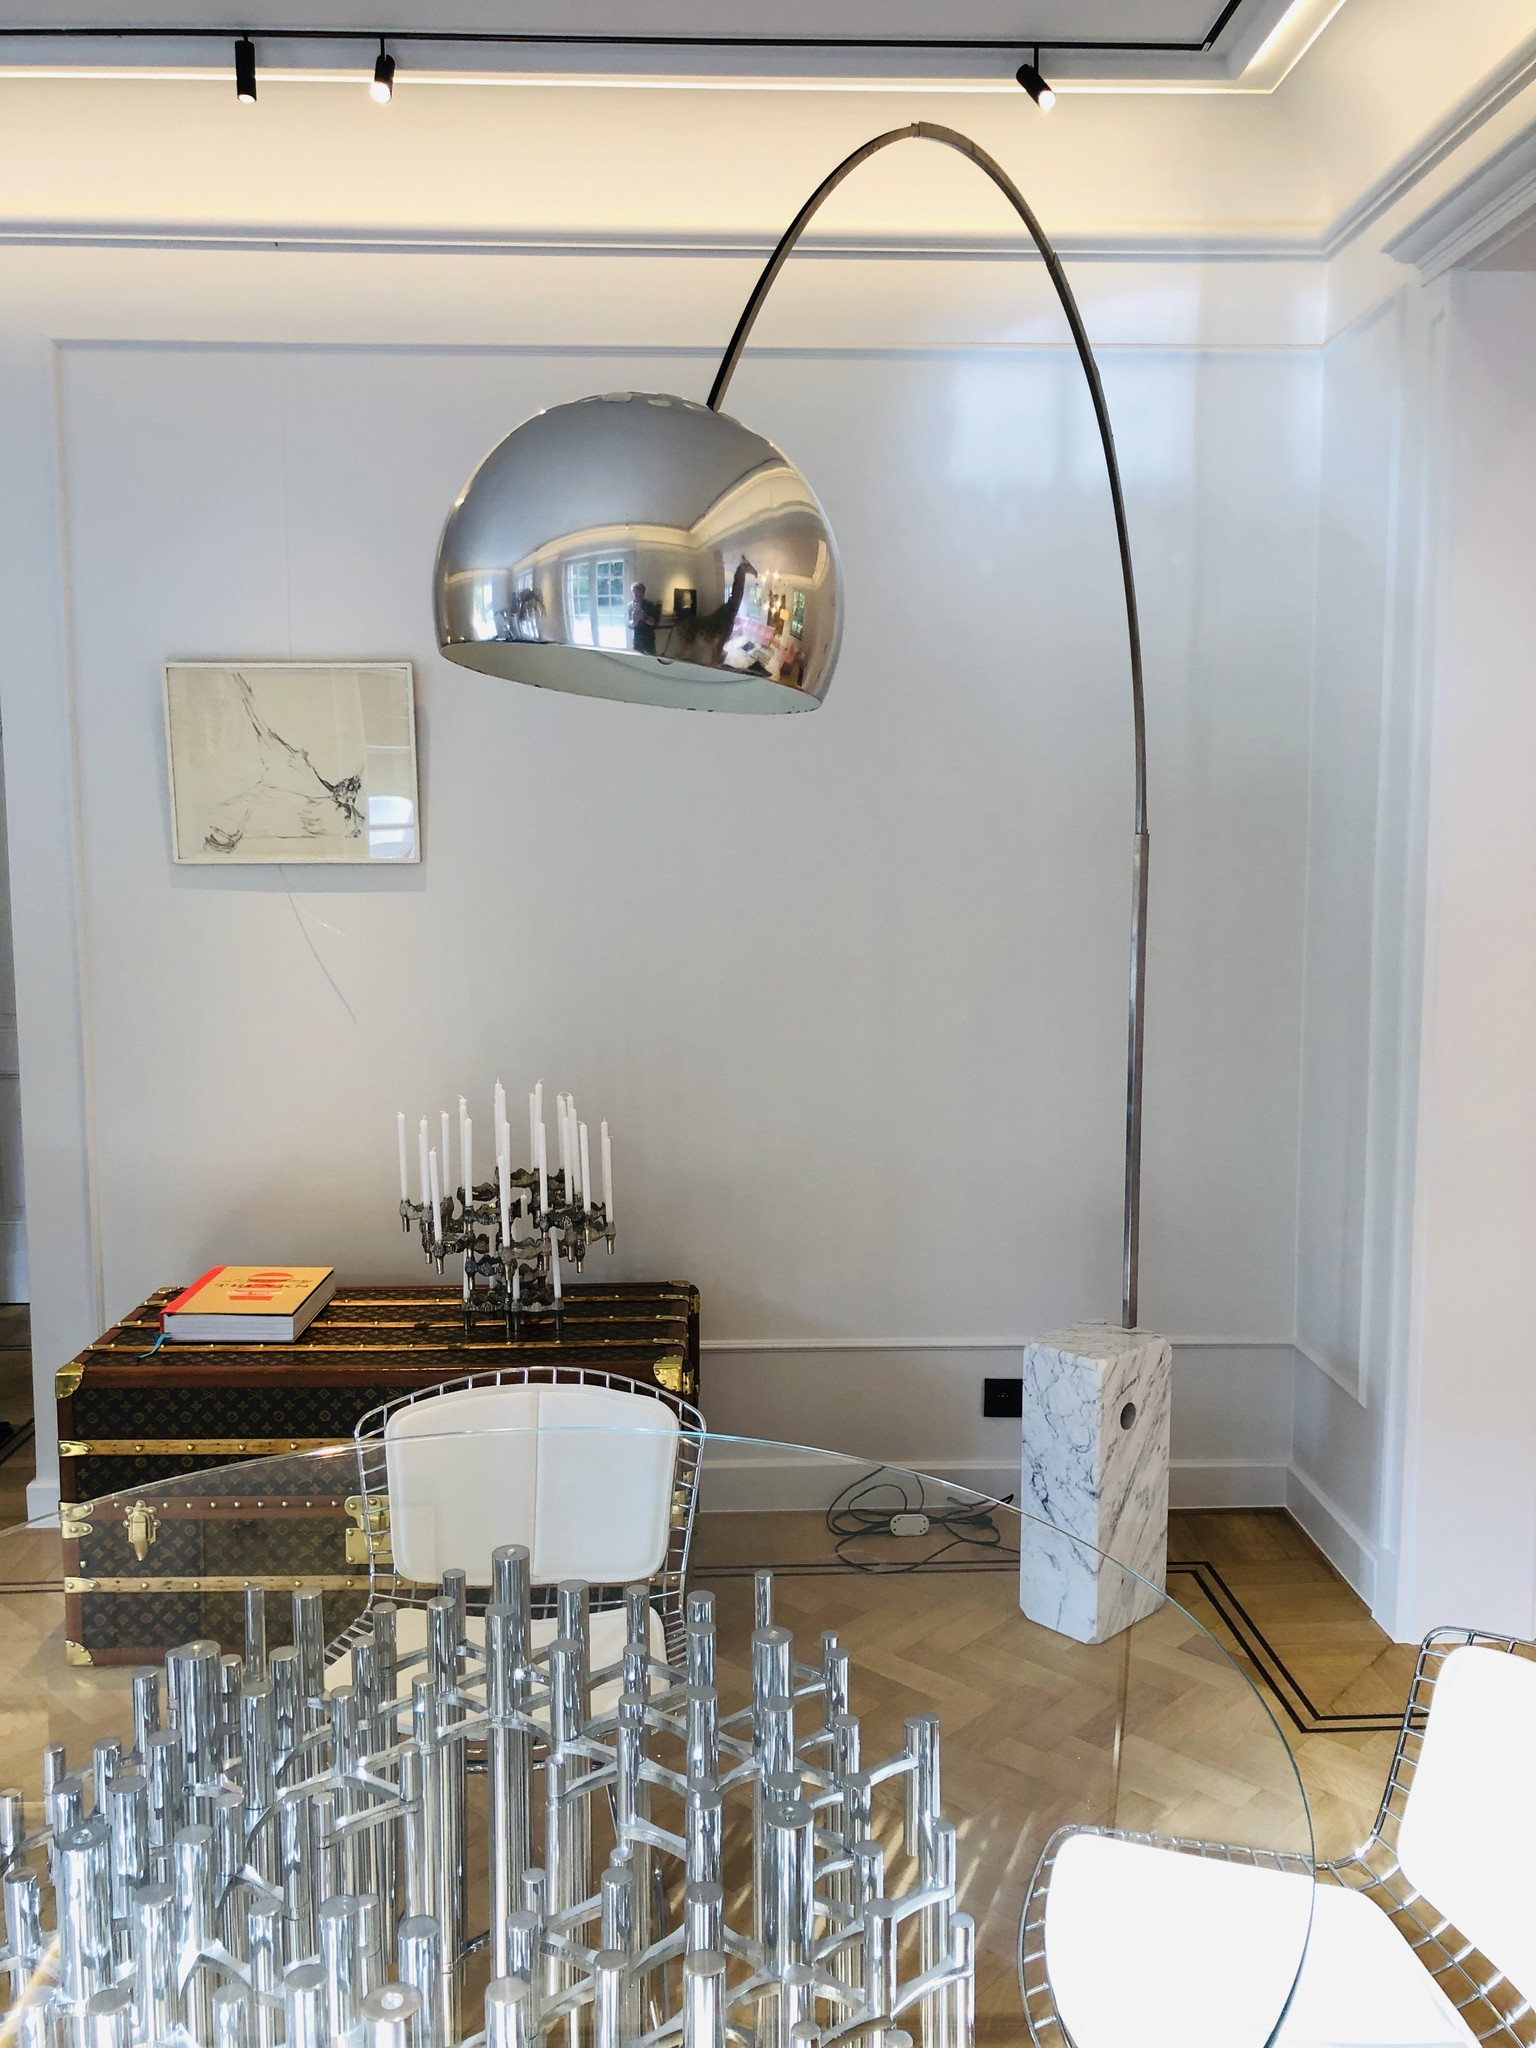 Vintage Flos Arco arc lamp